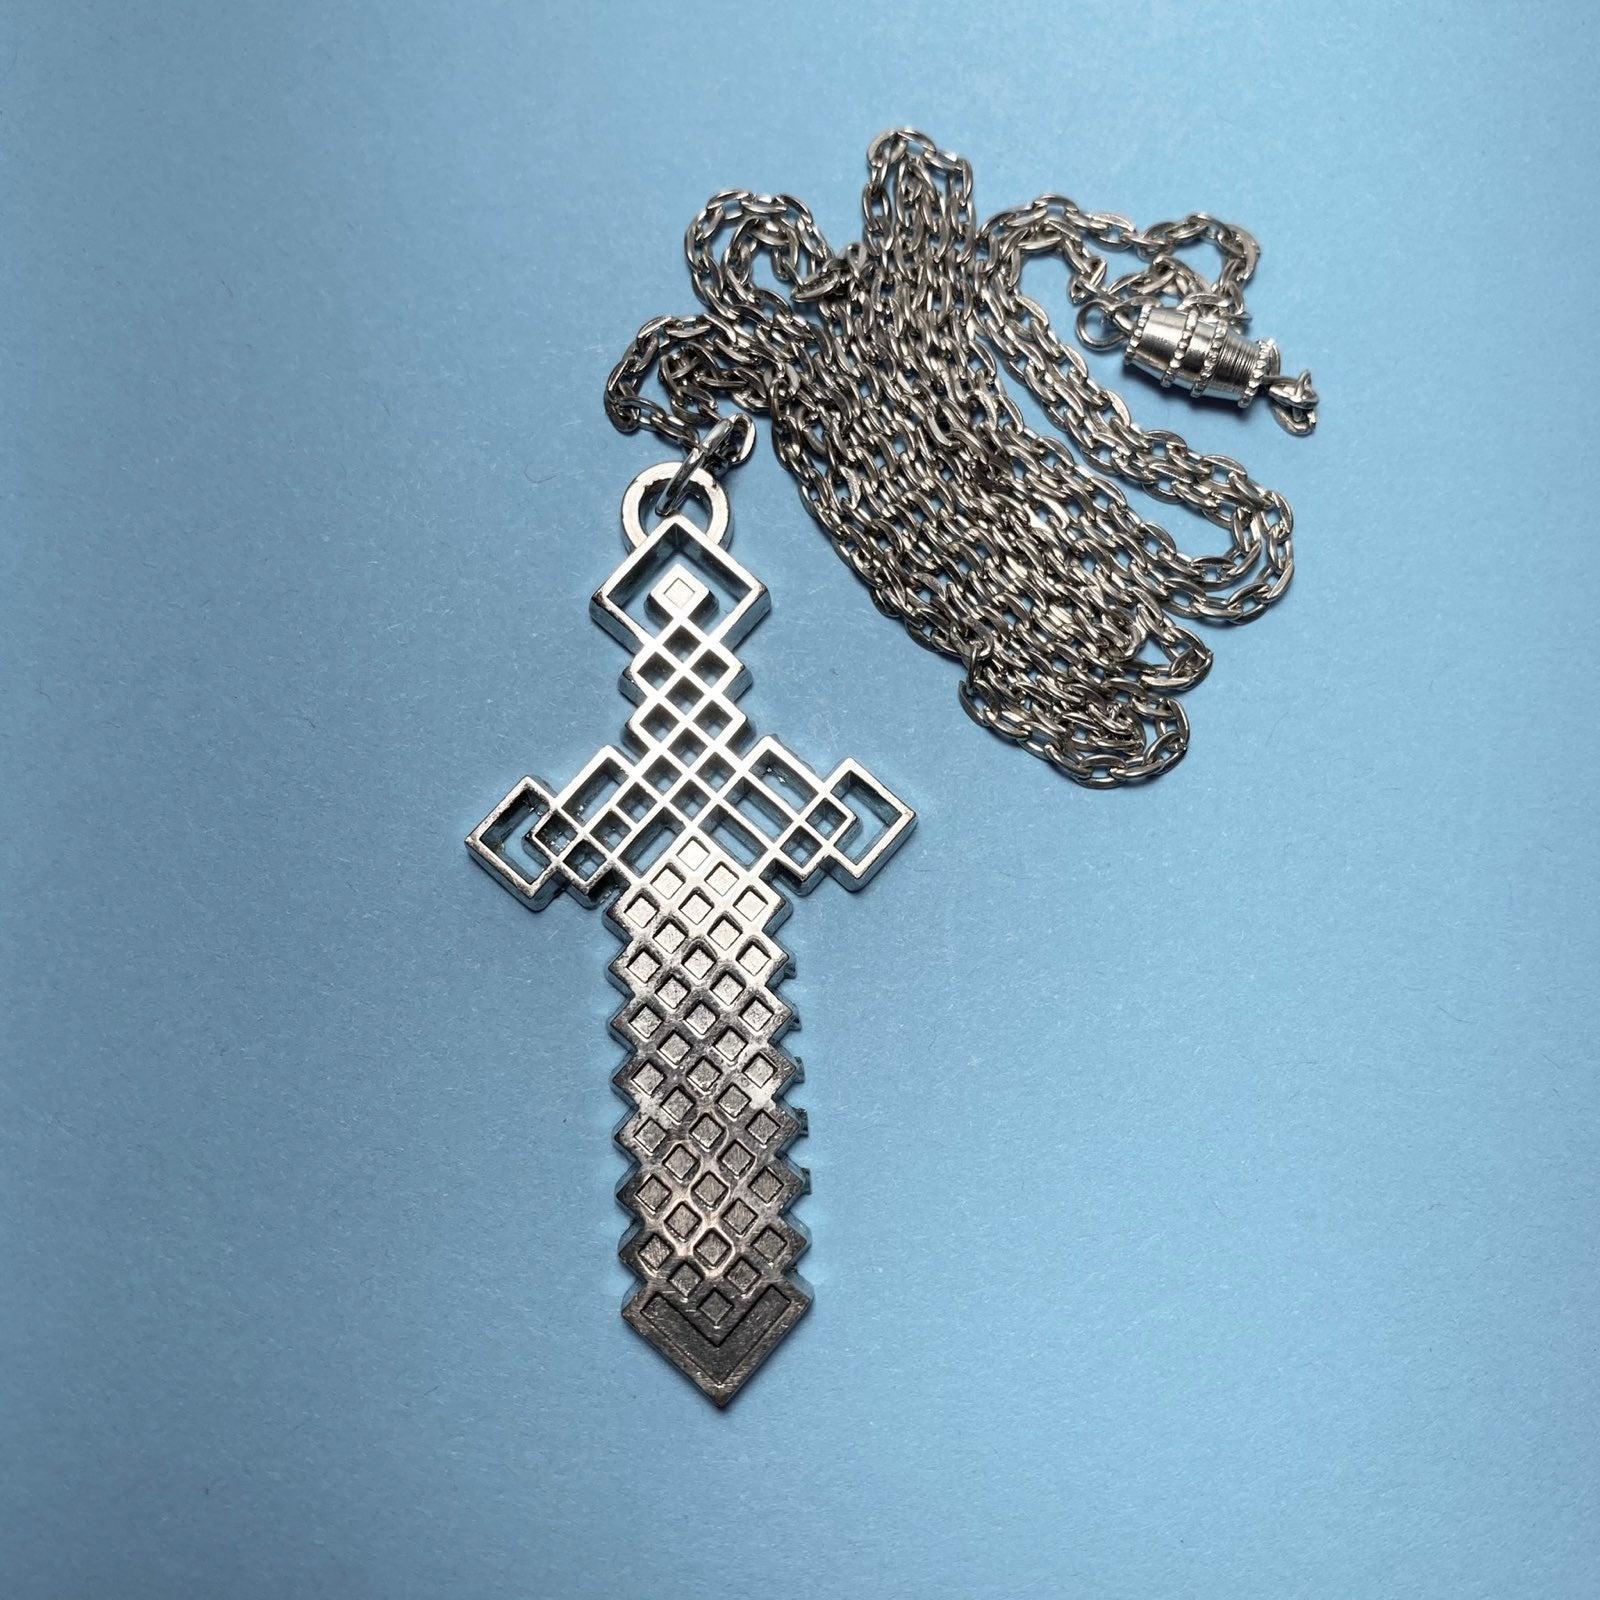 Minecraft Sword Pendant Necklace